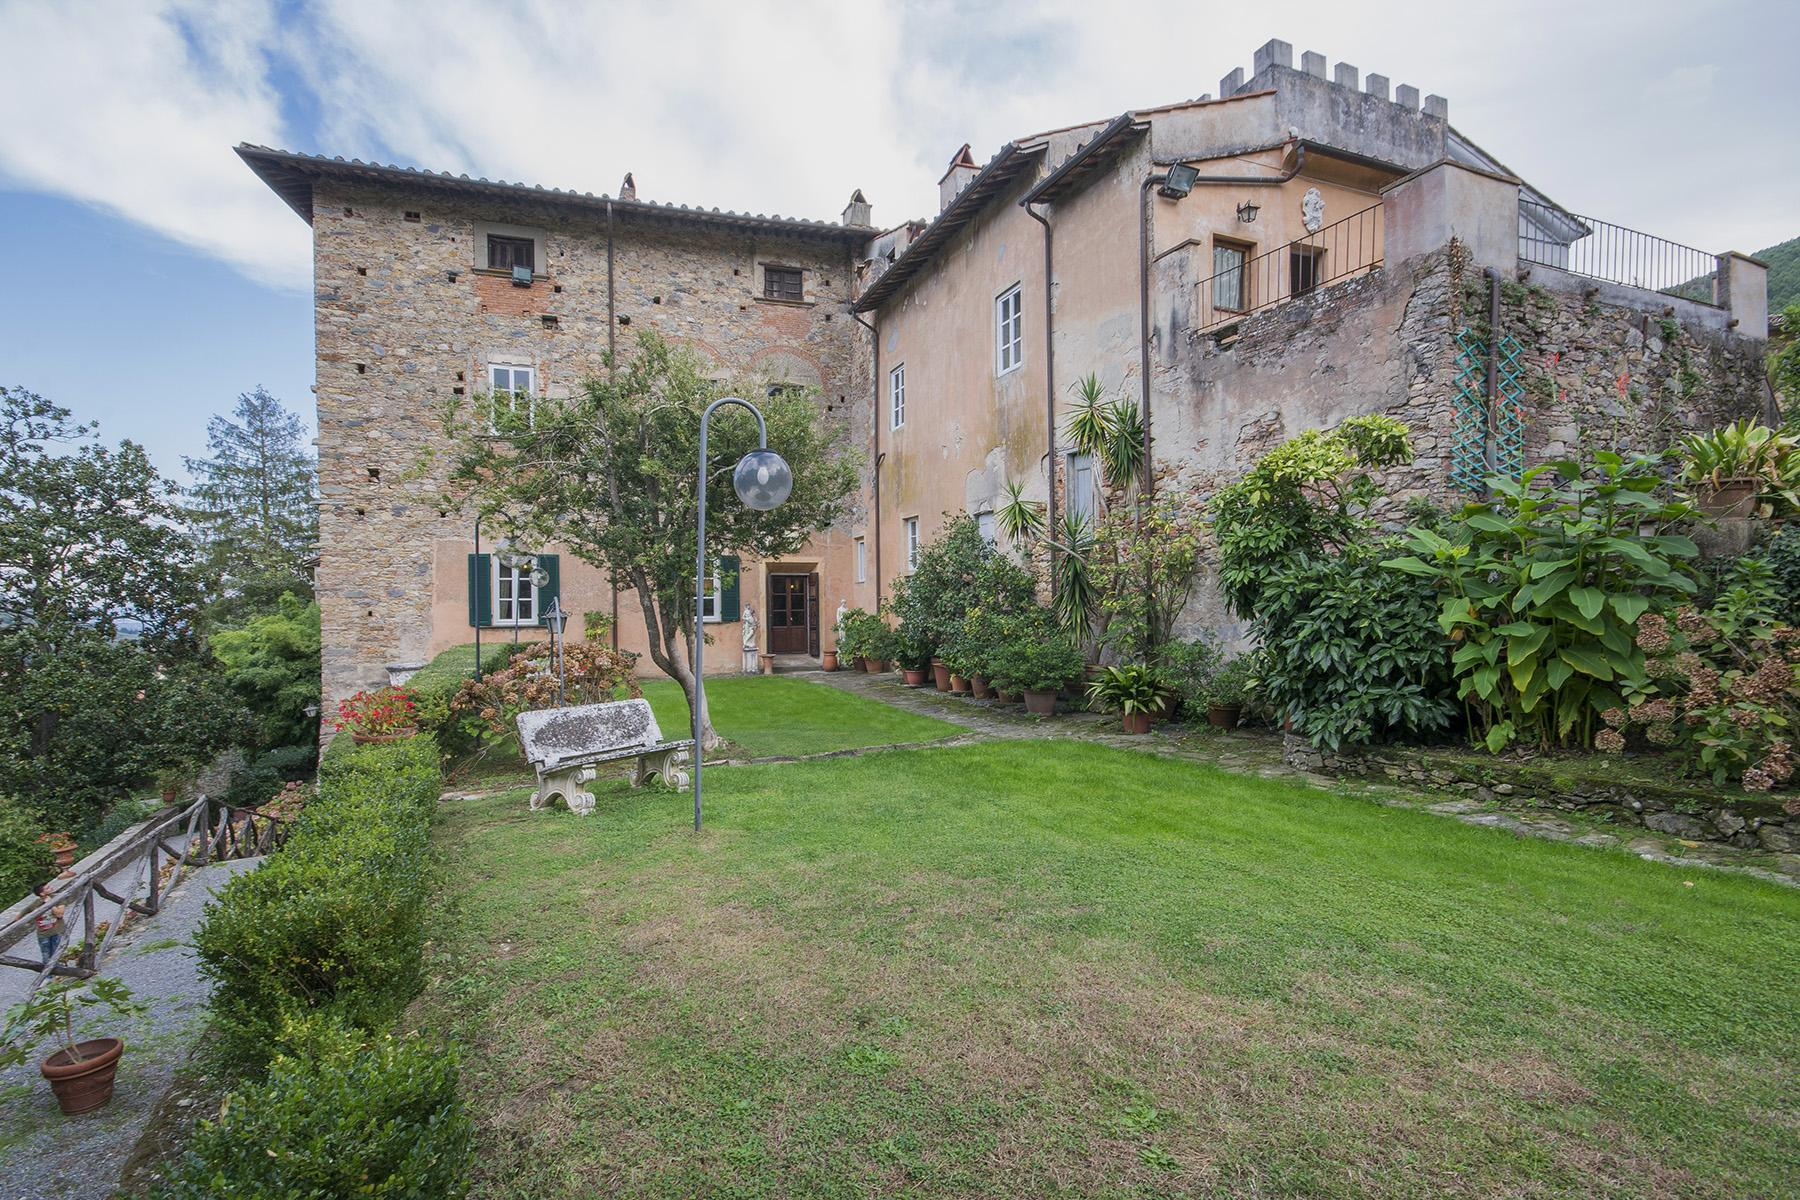 Wonderful Medicean Villa on the Pisan hills - 2